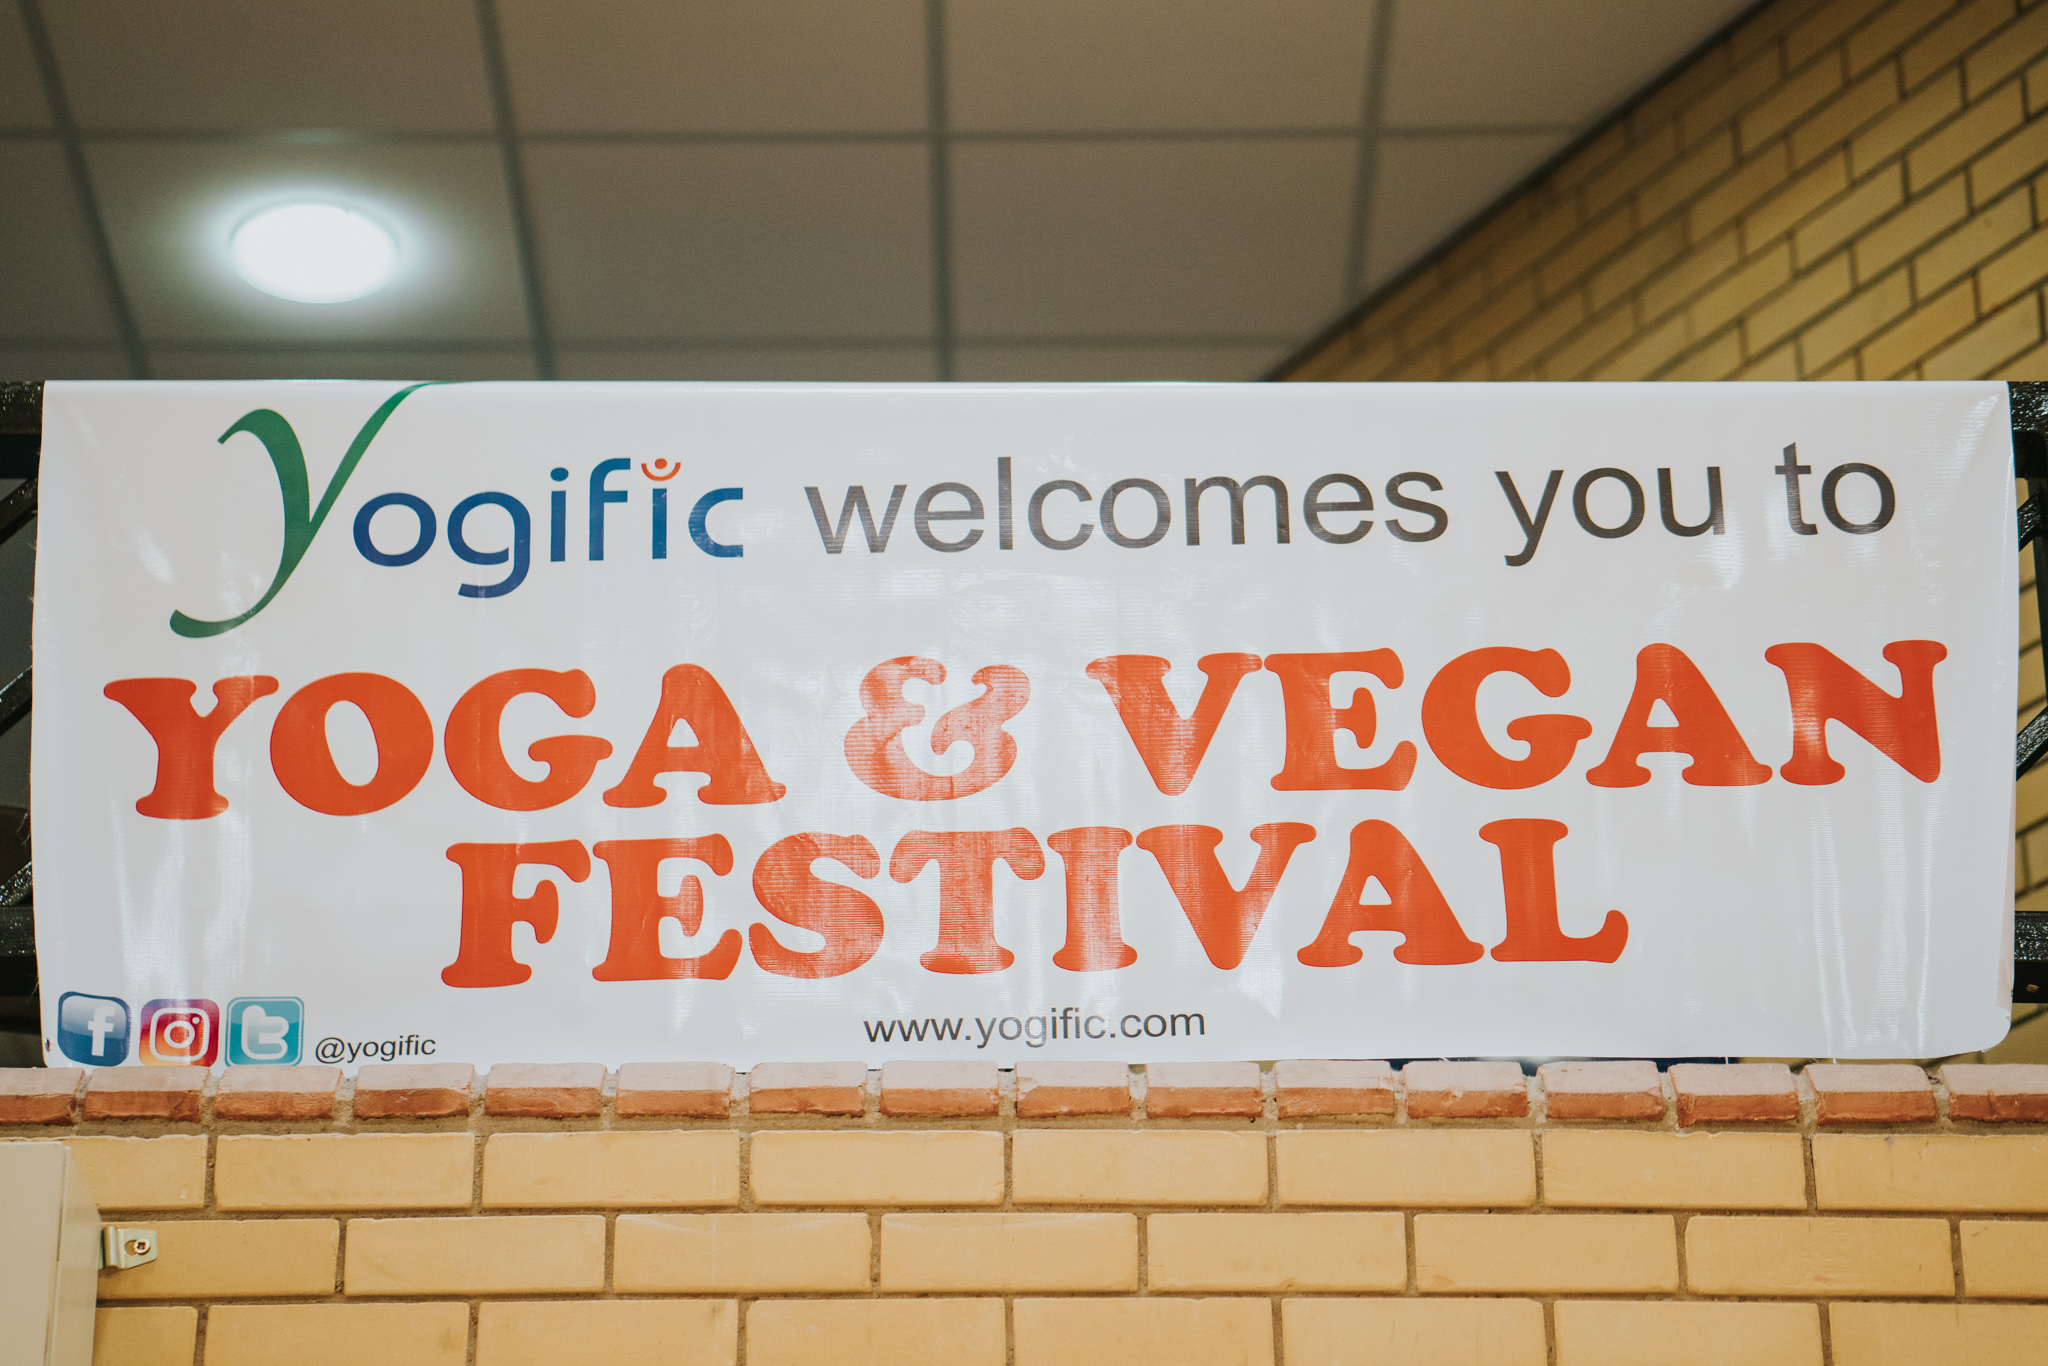 yogific-essex-yoga-vegan-festival-essex-university-grace-elizabeth-colchester-essex-alternative-wedding-lifestyle-photographer-suffolk-norfolk-devon-london-vegan-nights-cruelty-free (71 of 73).jpg